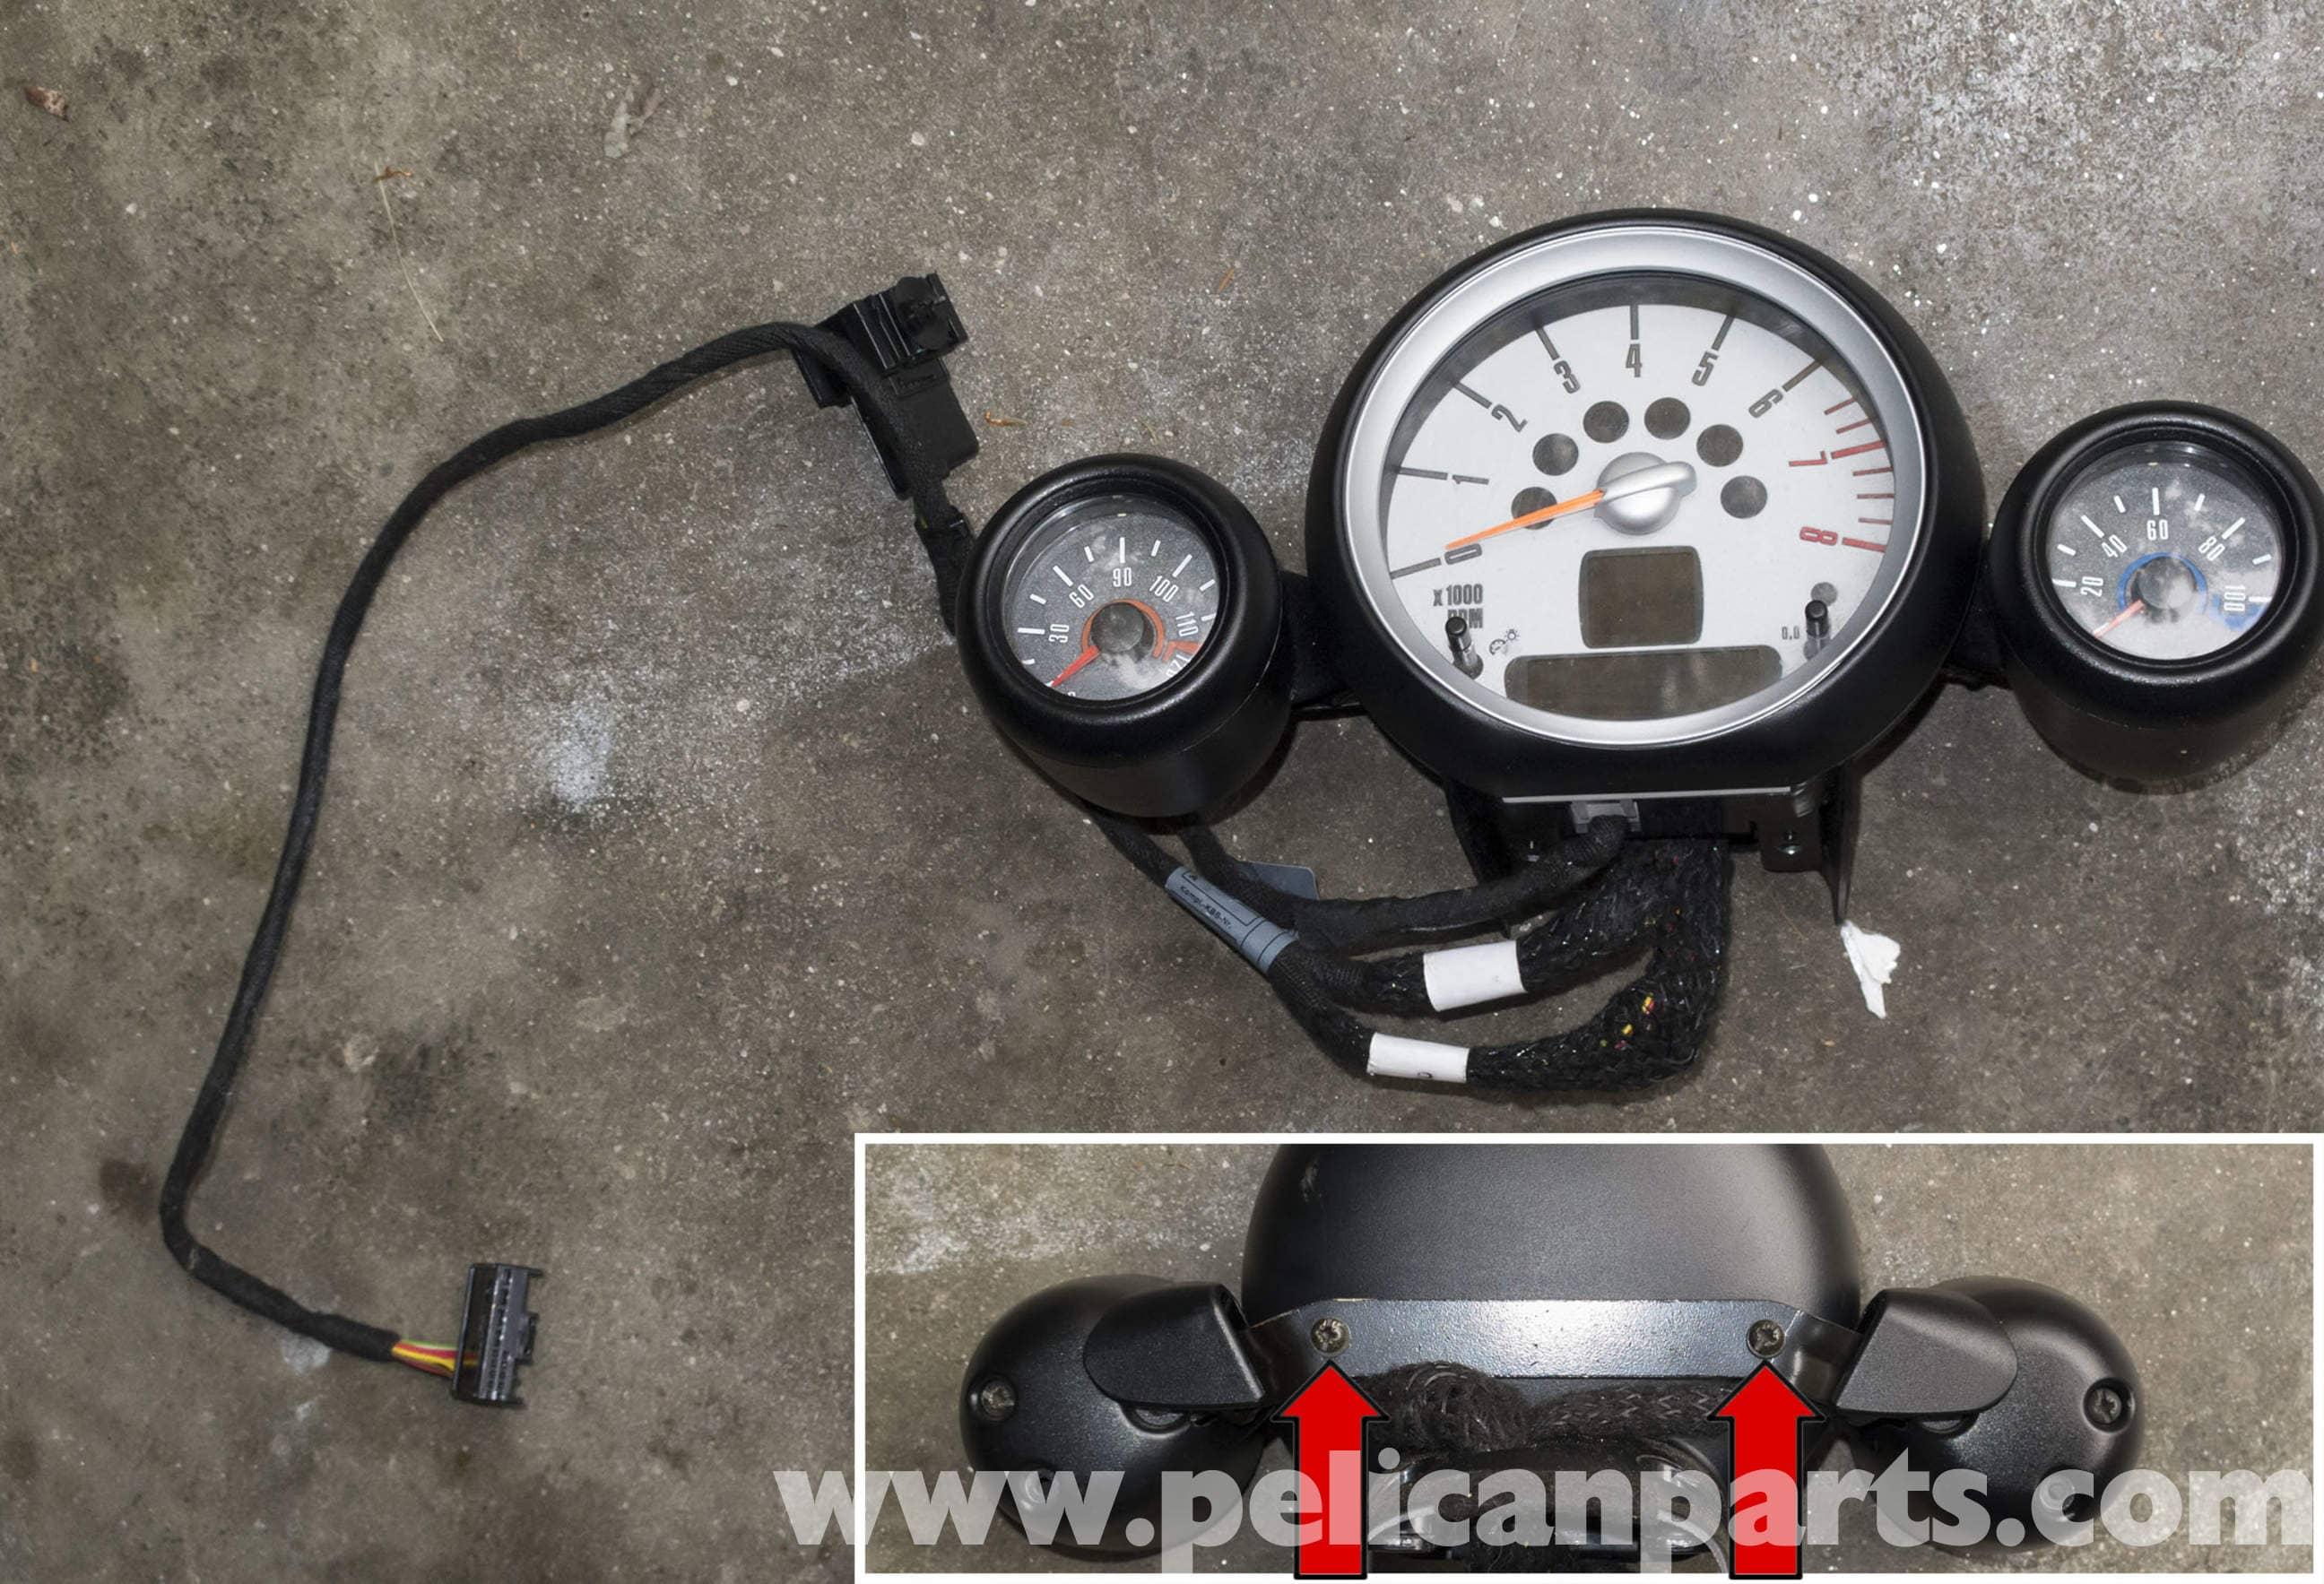 MINI Cooper R56 Tachometer Replacement (2007-2011) | Pelican